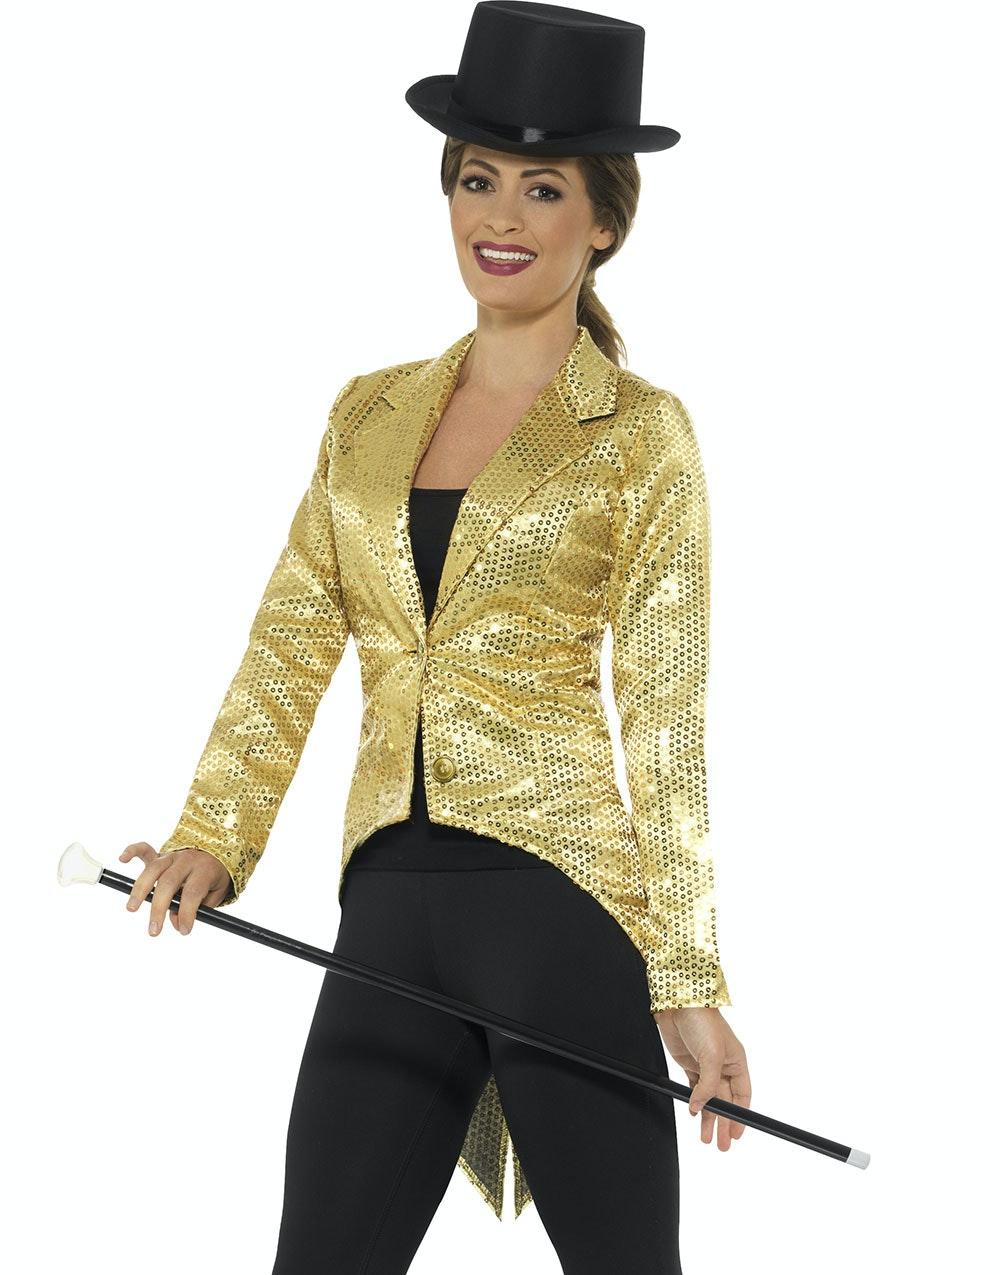 massasje bislett sexy halloween kostymer